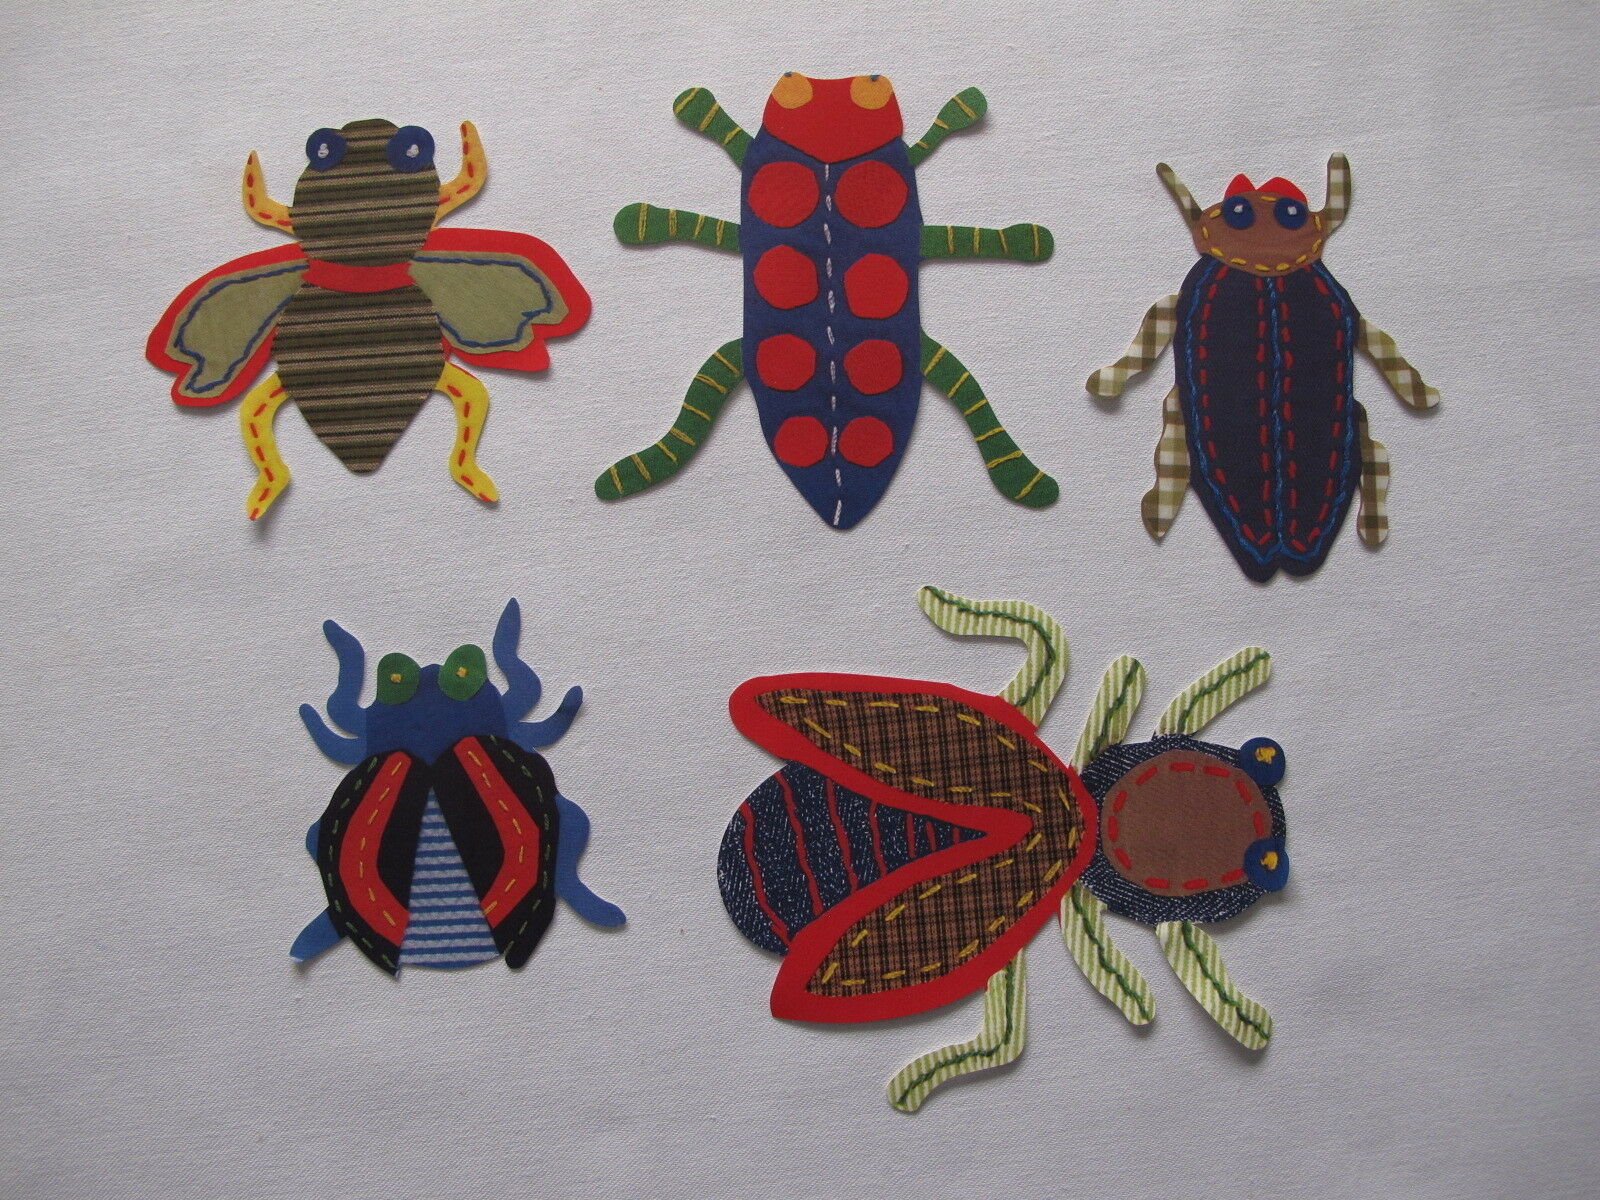 Pottery barn kids Set of 25 Max BUGS WALLIES Wall Art Decor Cutouts NEW Rare